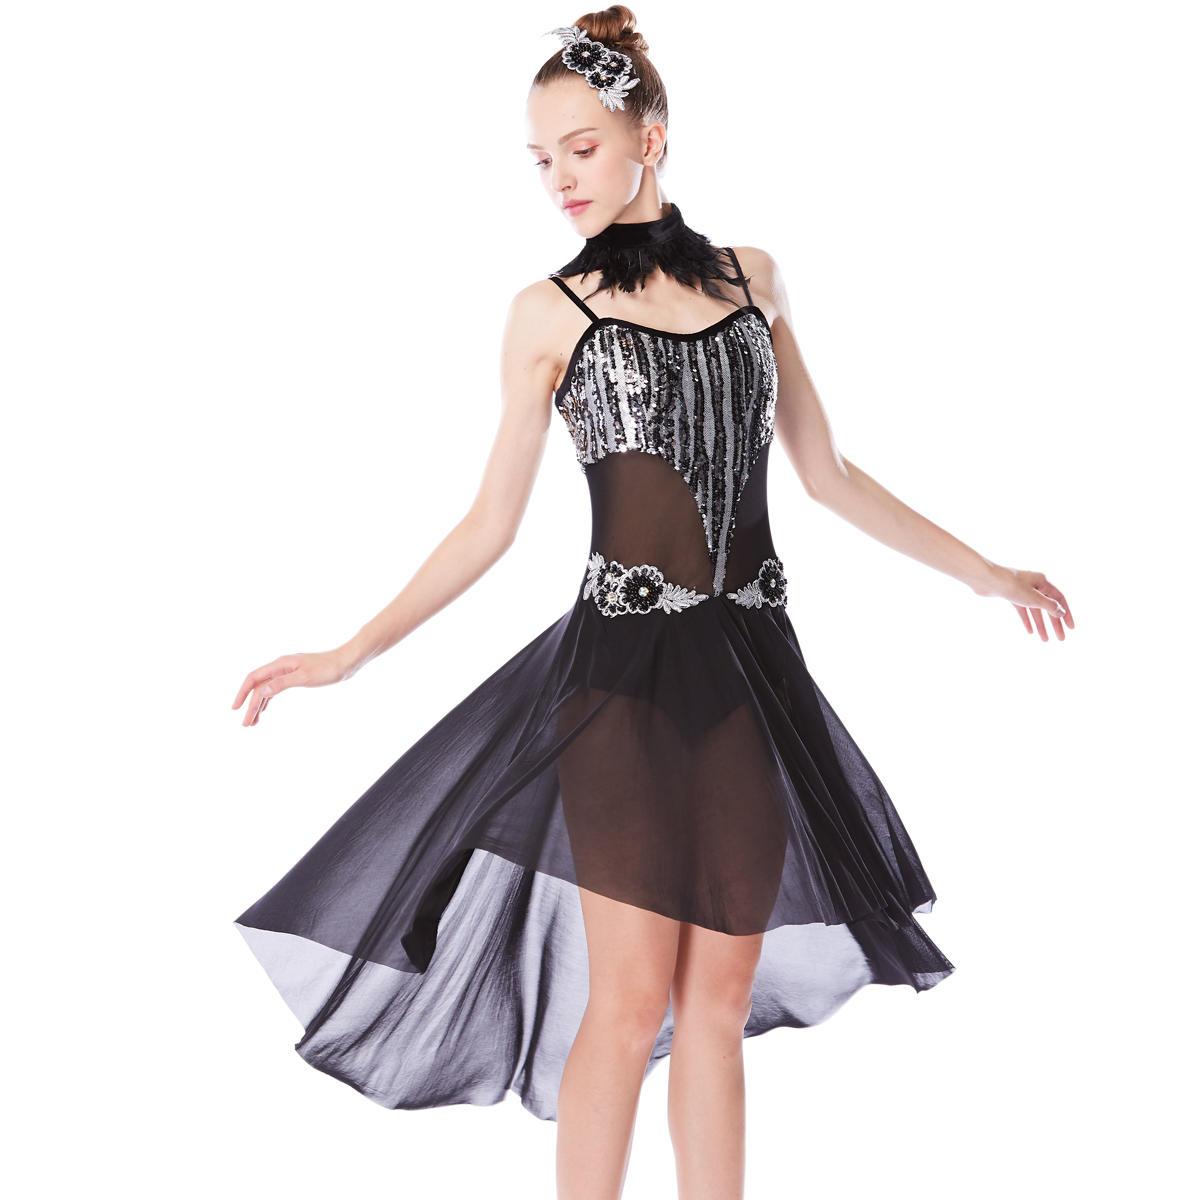 MiDee  Top Lyrical Dance Costume Dress Mesh Skirt Dress